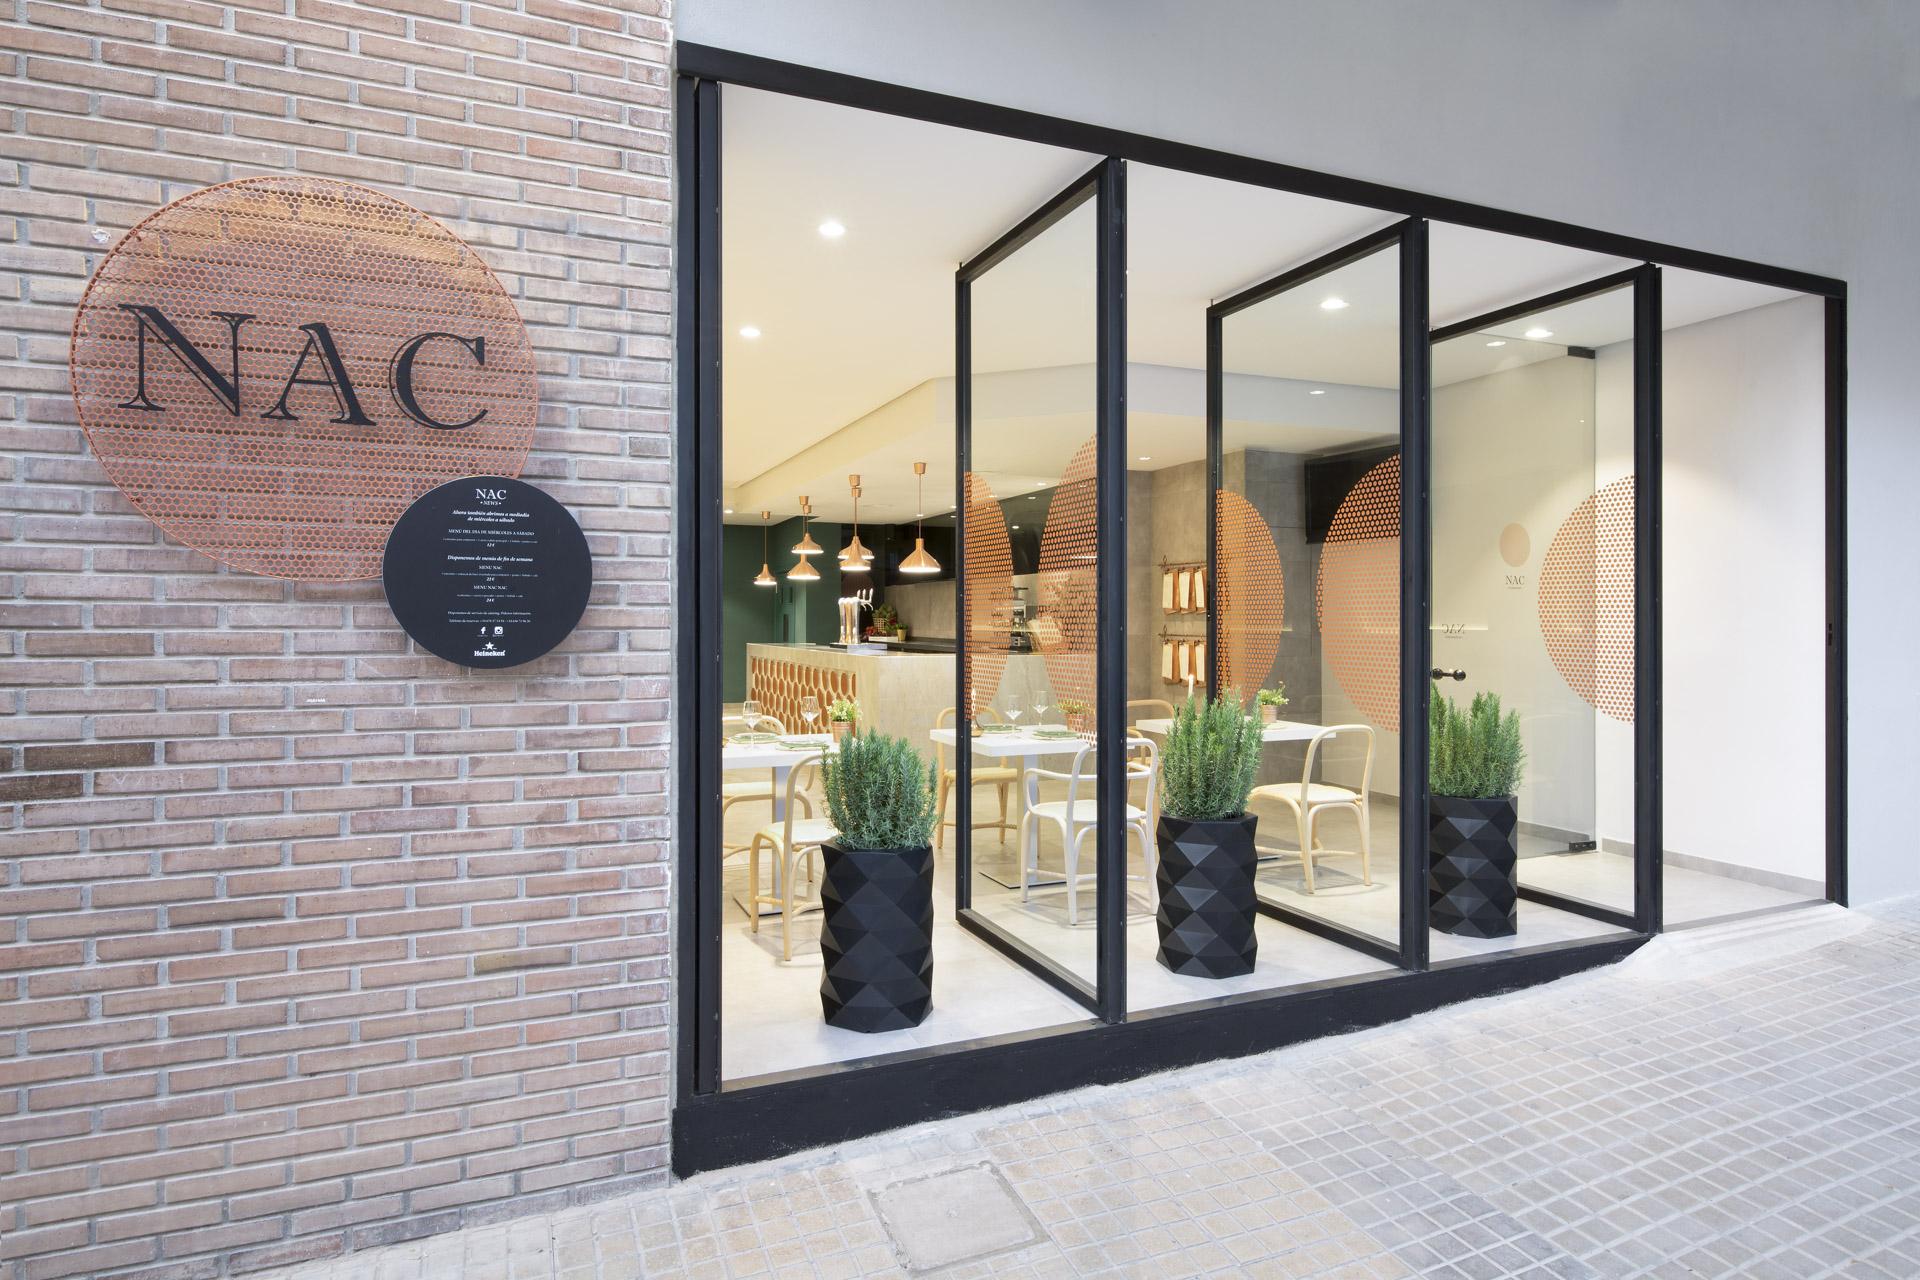 fotografia-arquitectura-valencia-german-cabo-estudihac-restaurante-nac-ontinyent-03